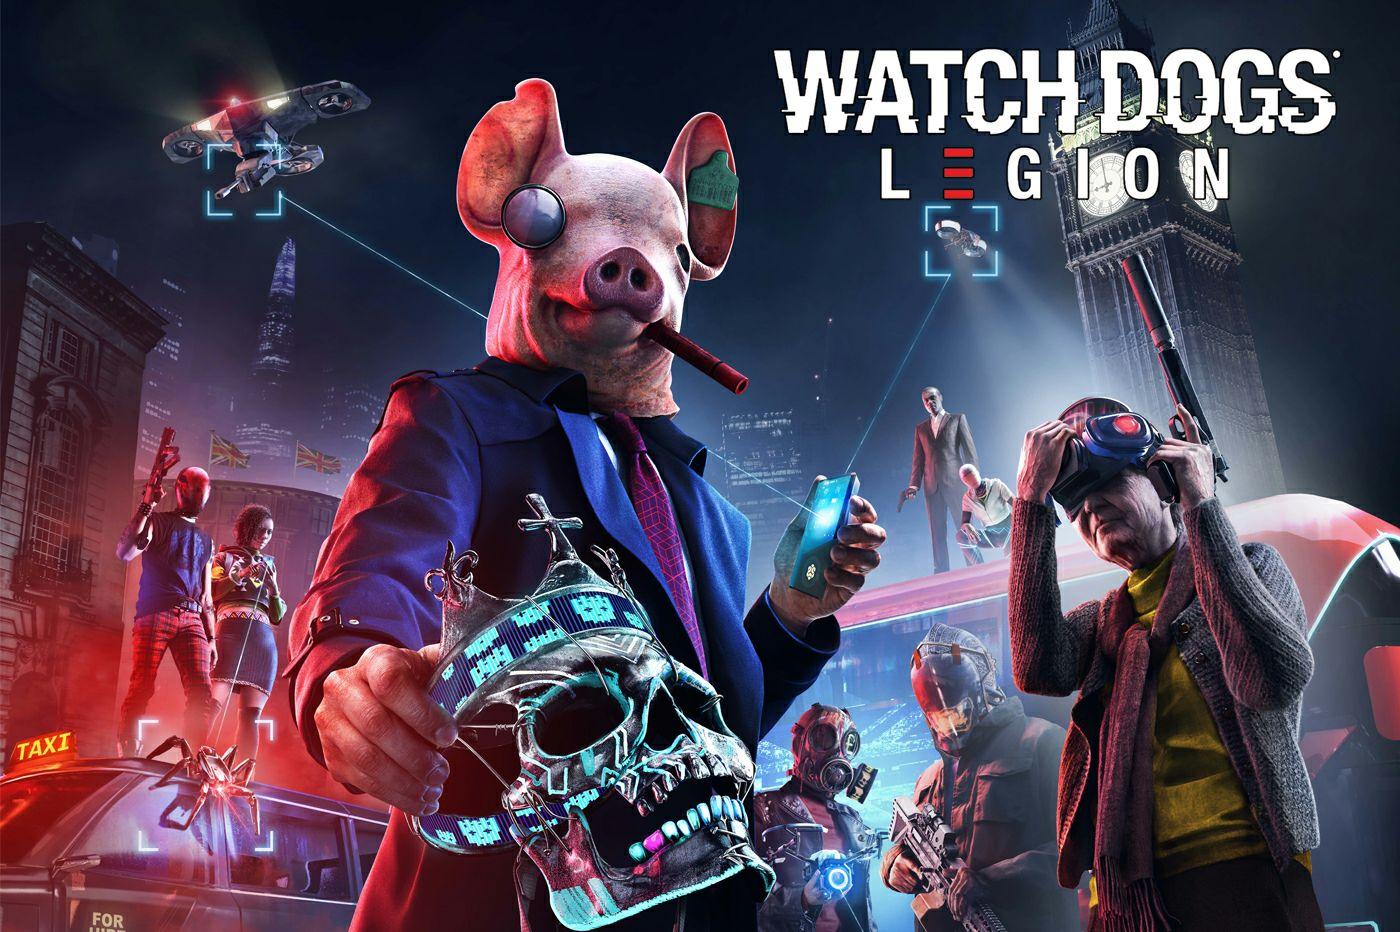 Watch Dogs Legion sur Xbox One (Compatible Series X) ou PS4 + Poster A2 + Porte clef lapins crétins